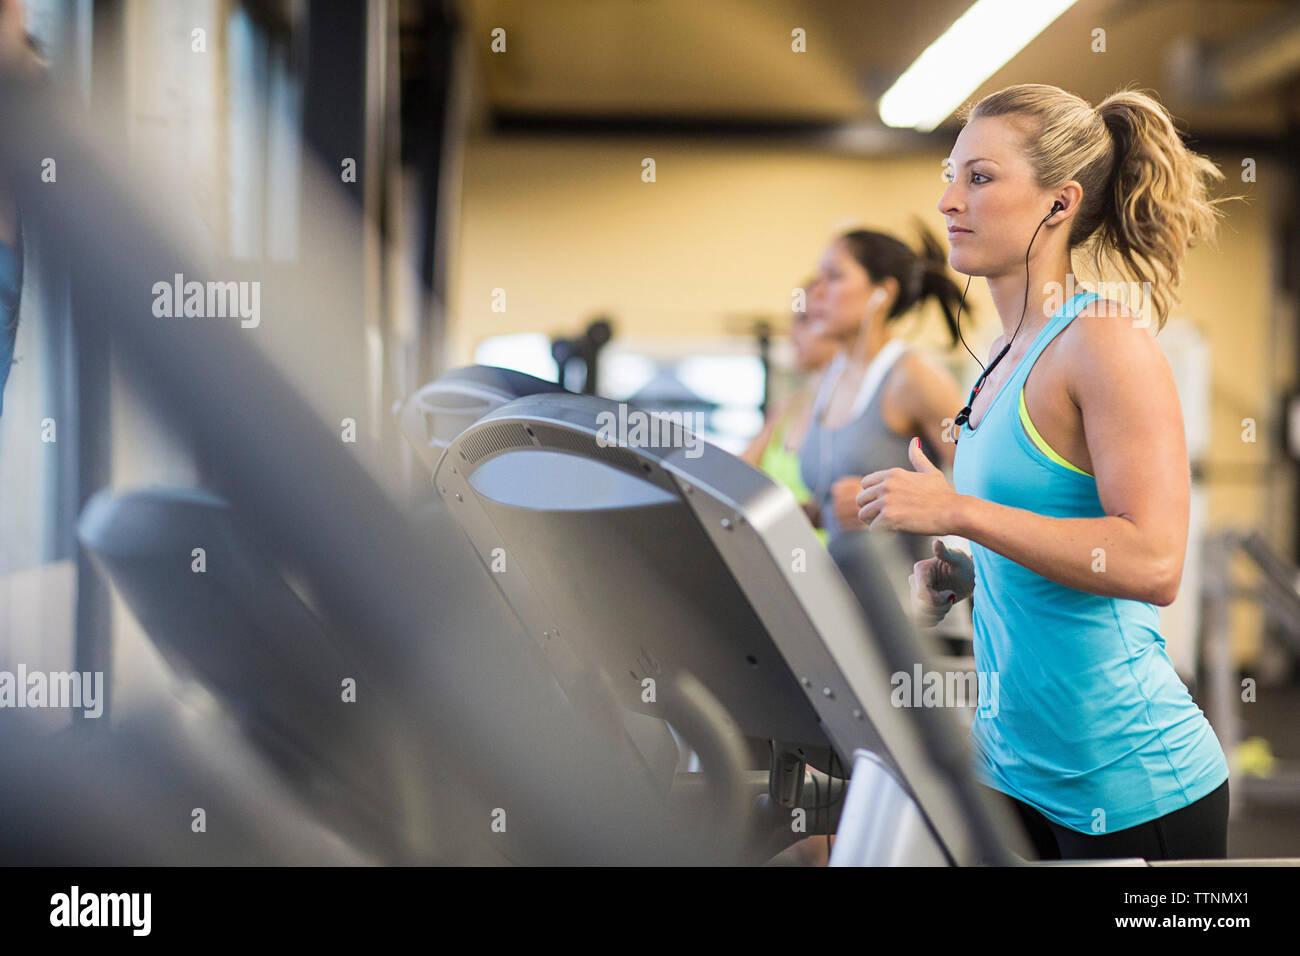 Women exercising on treadmills in gym - Stock Image